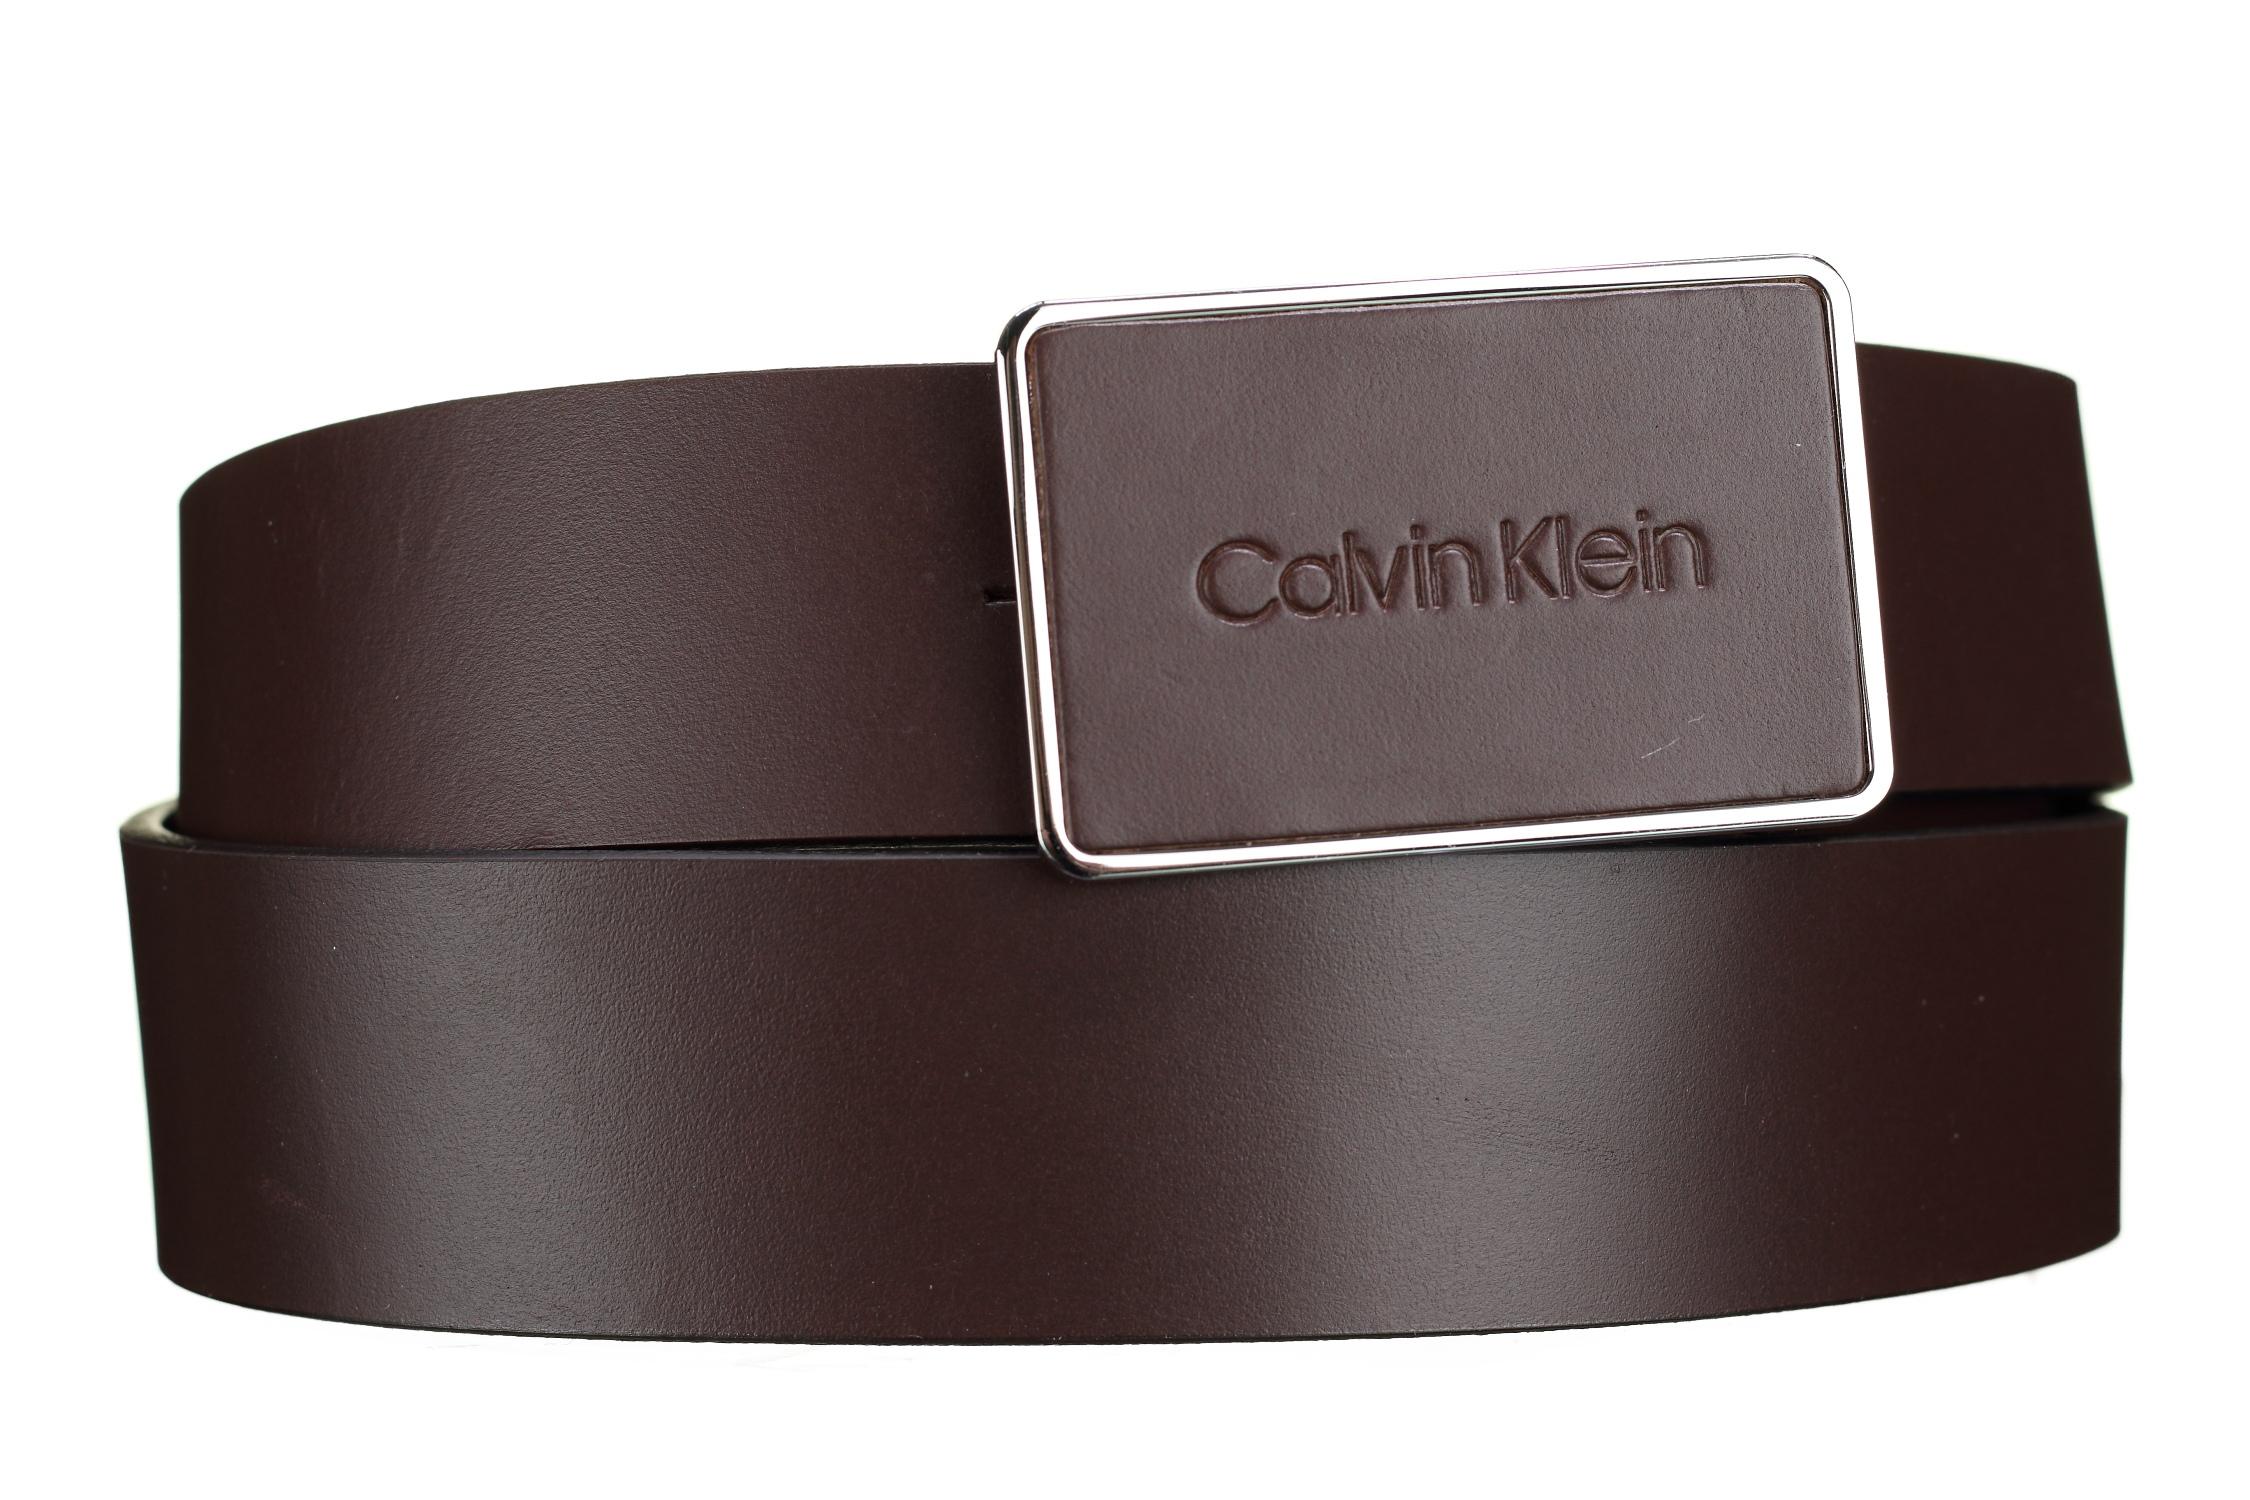 https://www.leadermode.com/185263/calvin-klein-k50k505456-gue-dark-brown.jpg